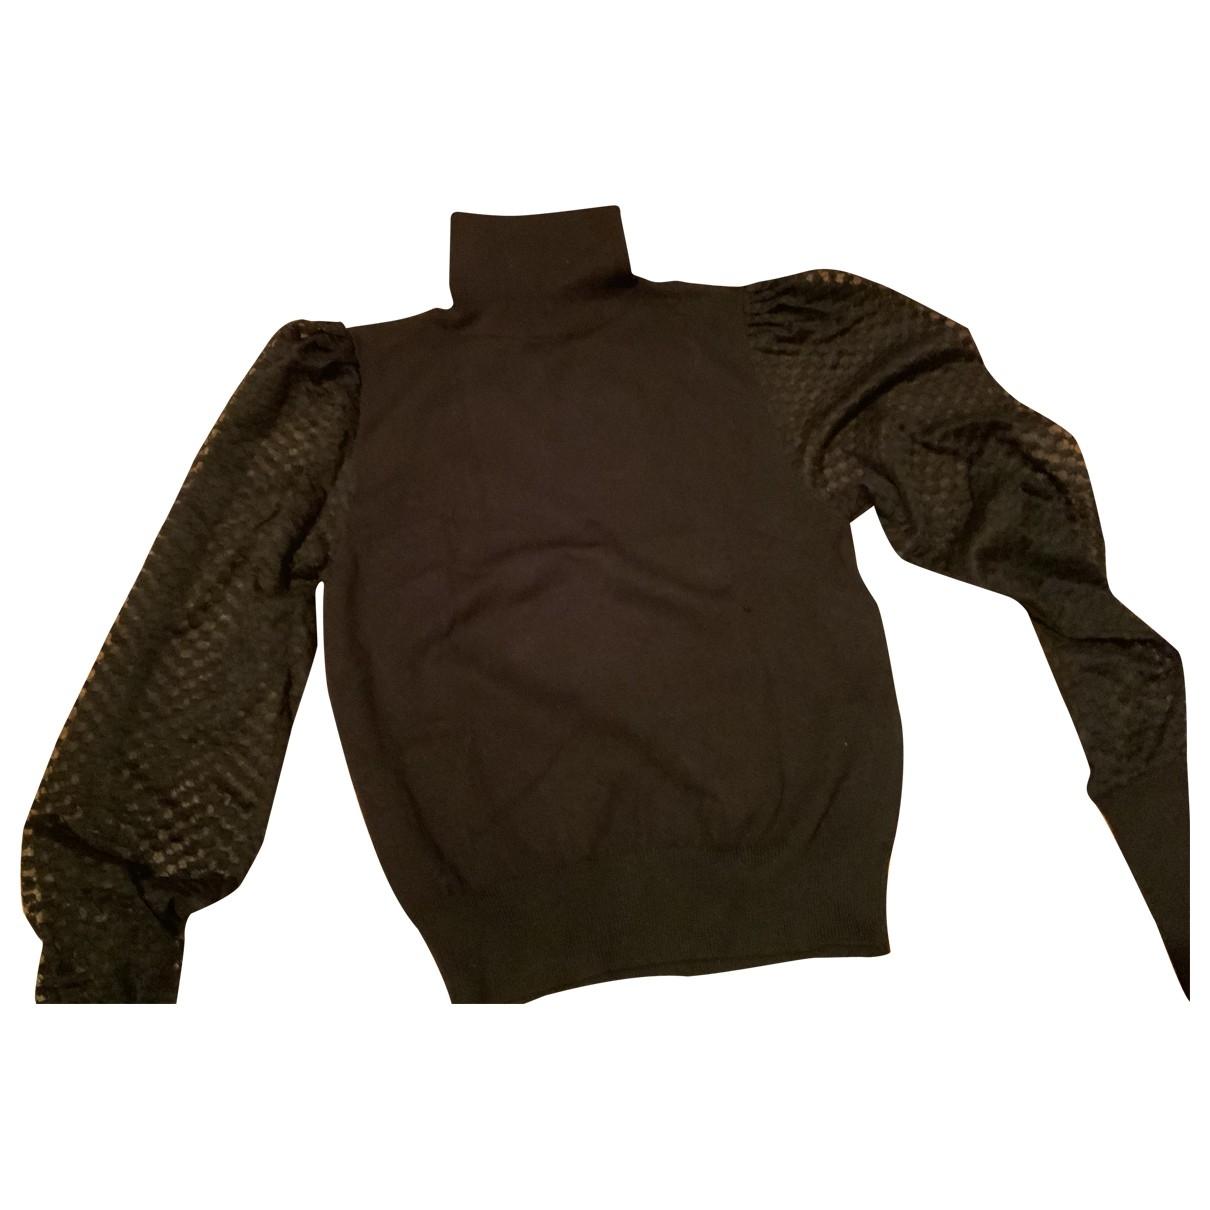 Zara - Pull   pour femme en laine - noir